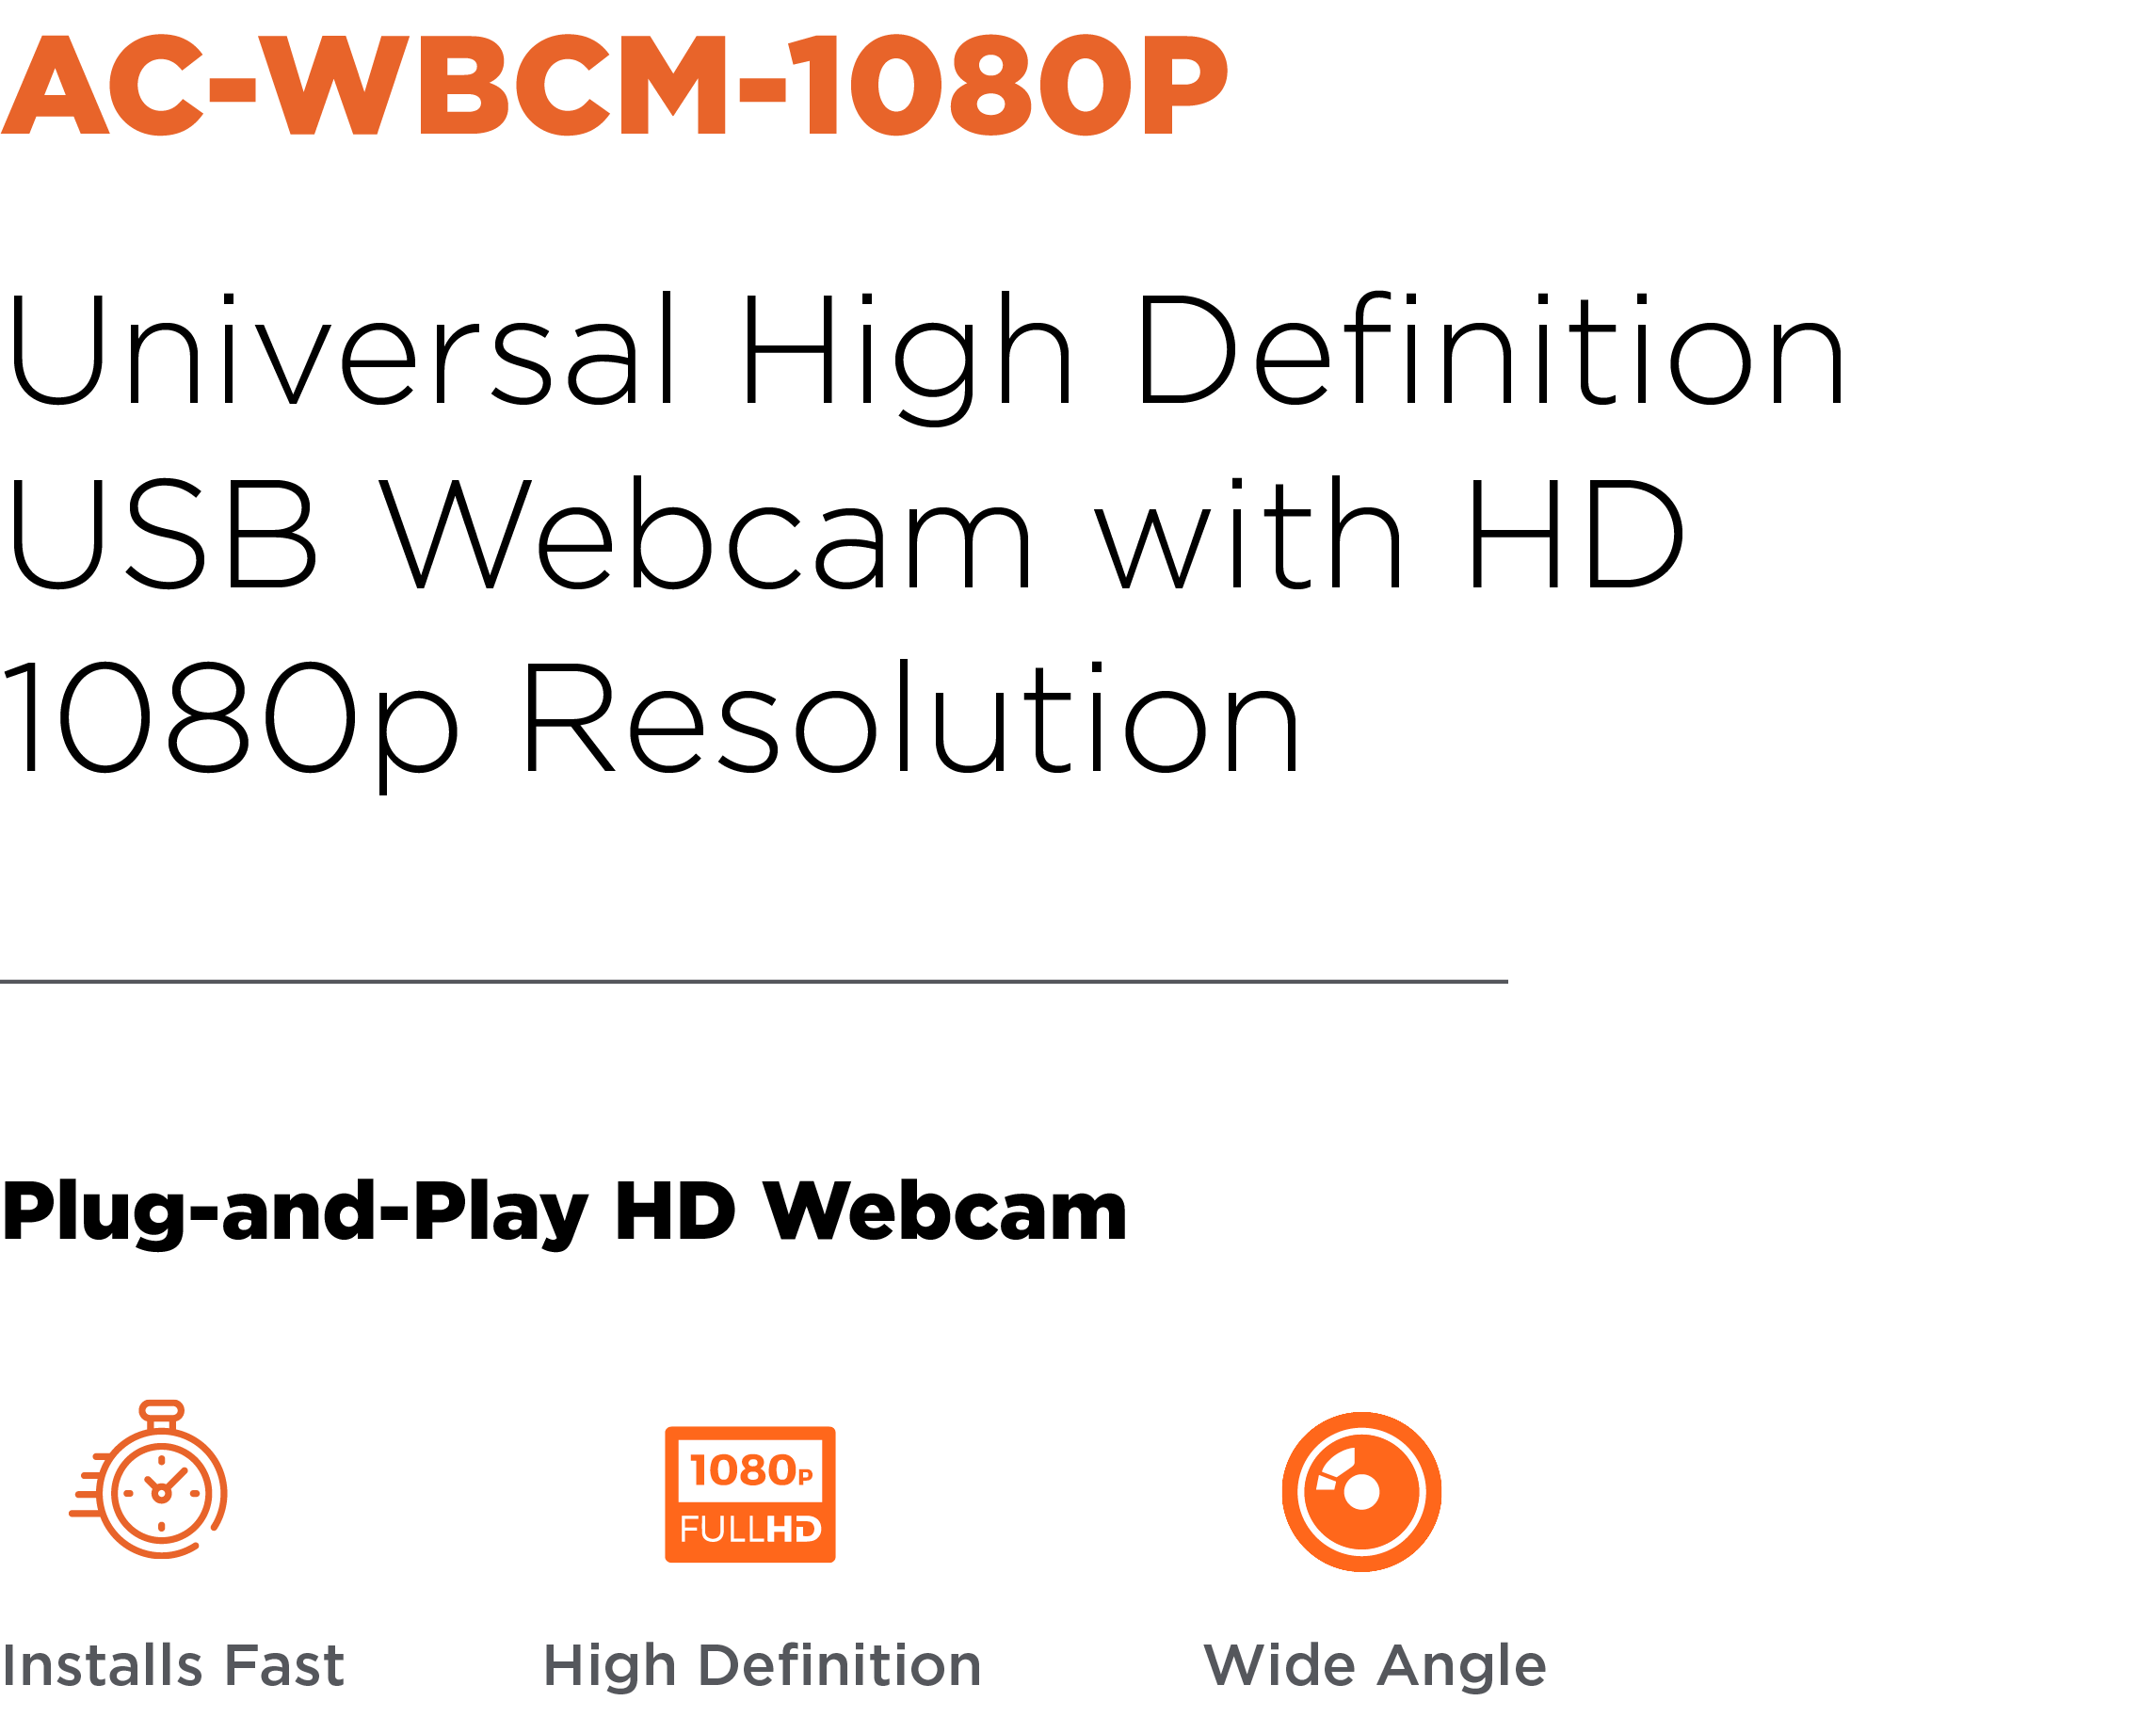 Anywhere Cart AC-WBCM-1080P: Header